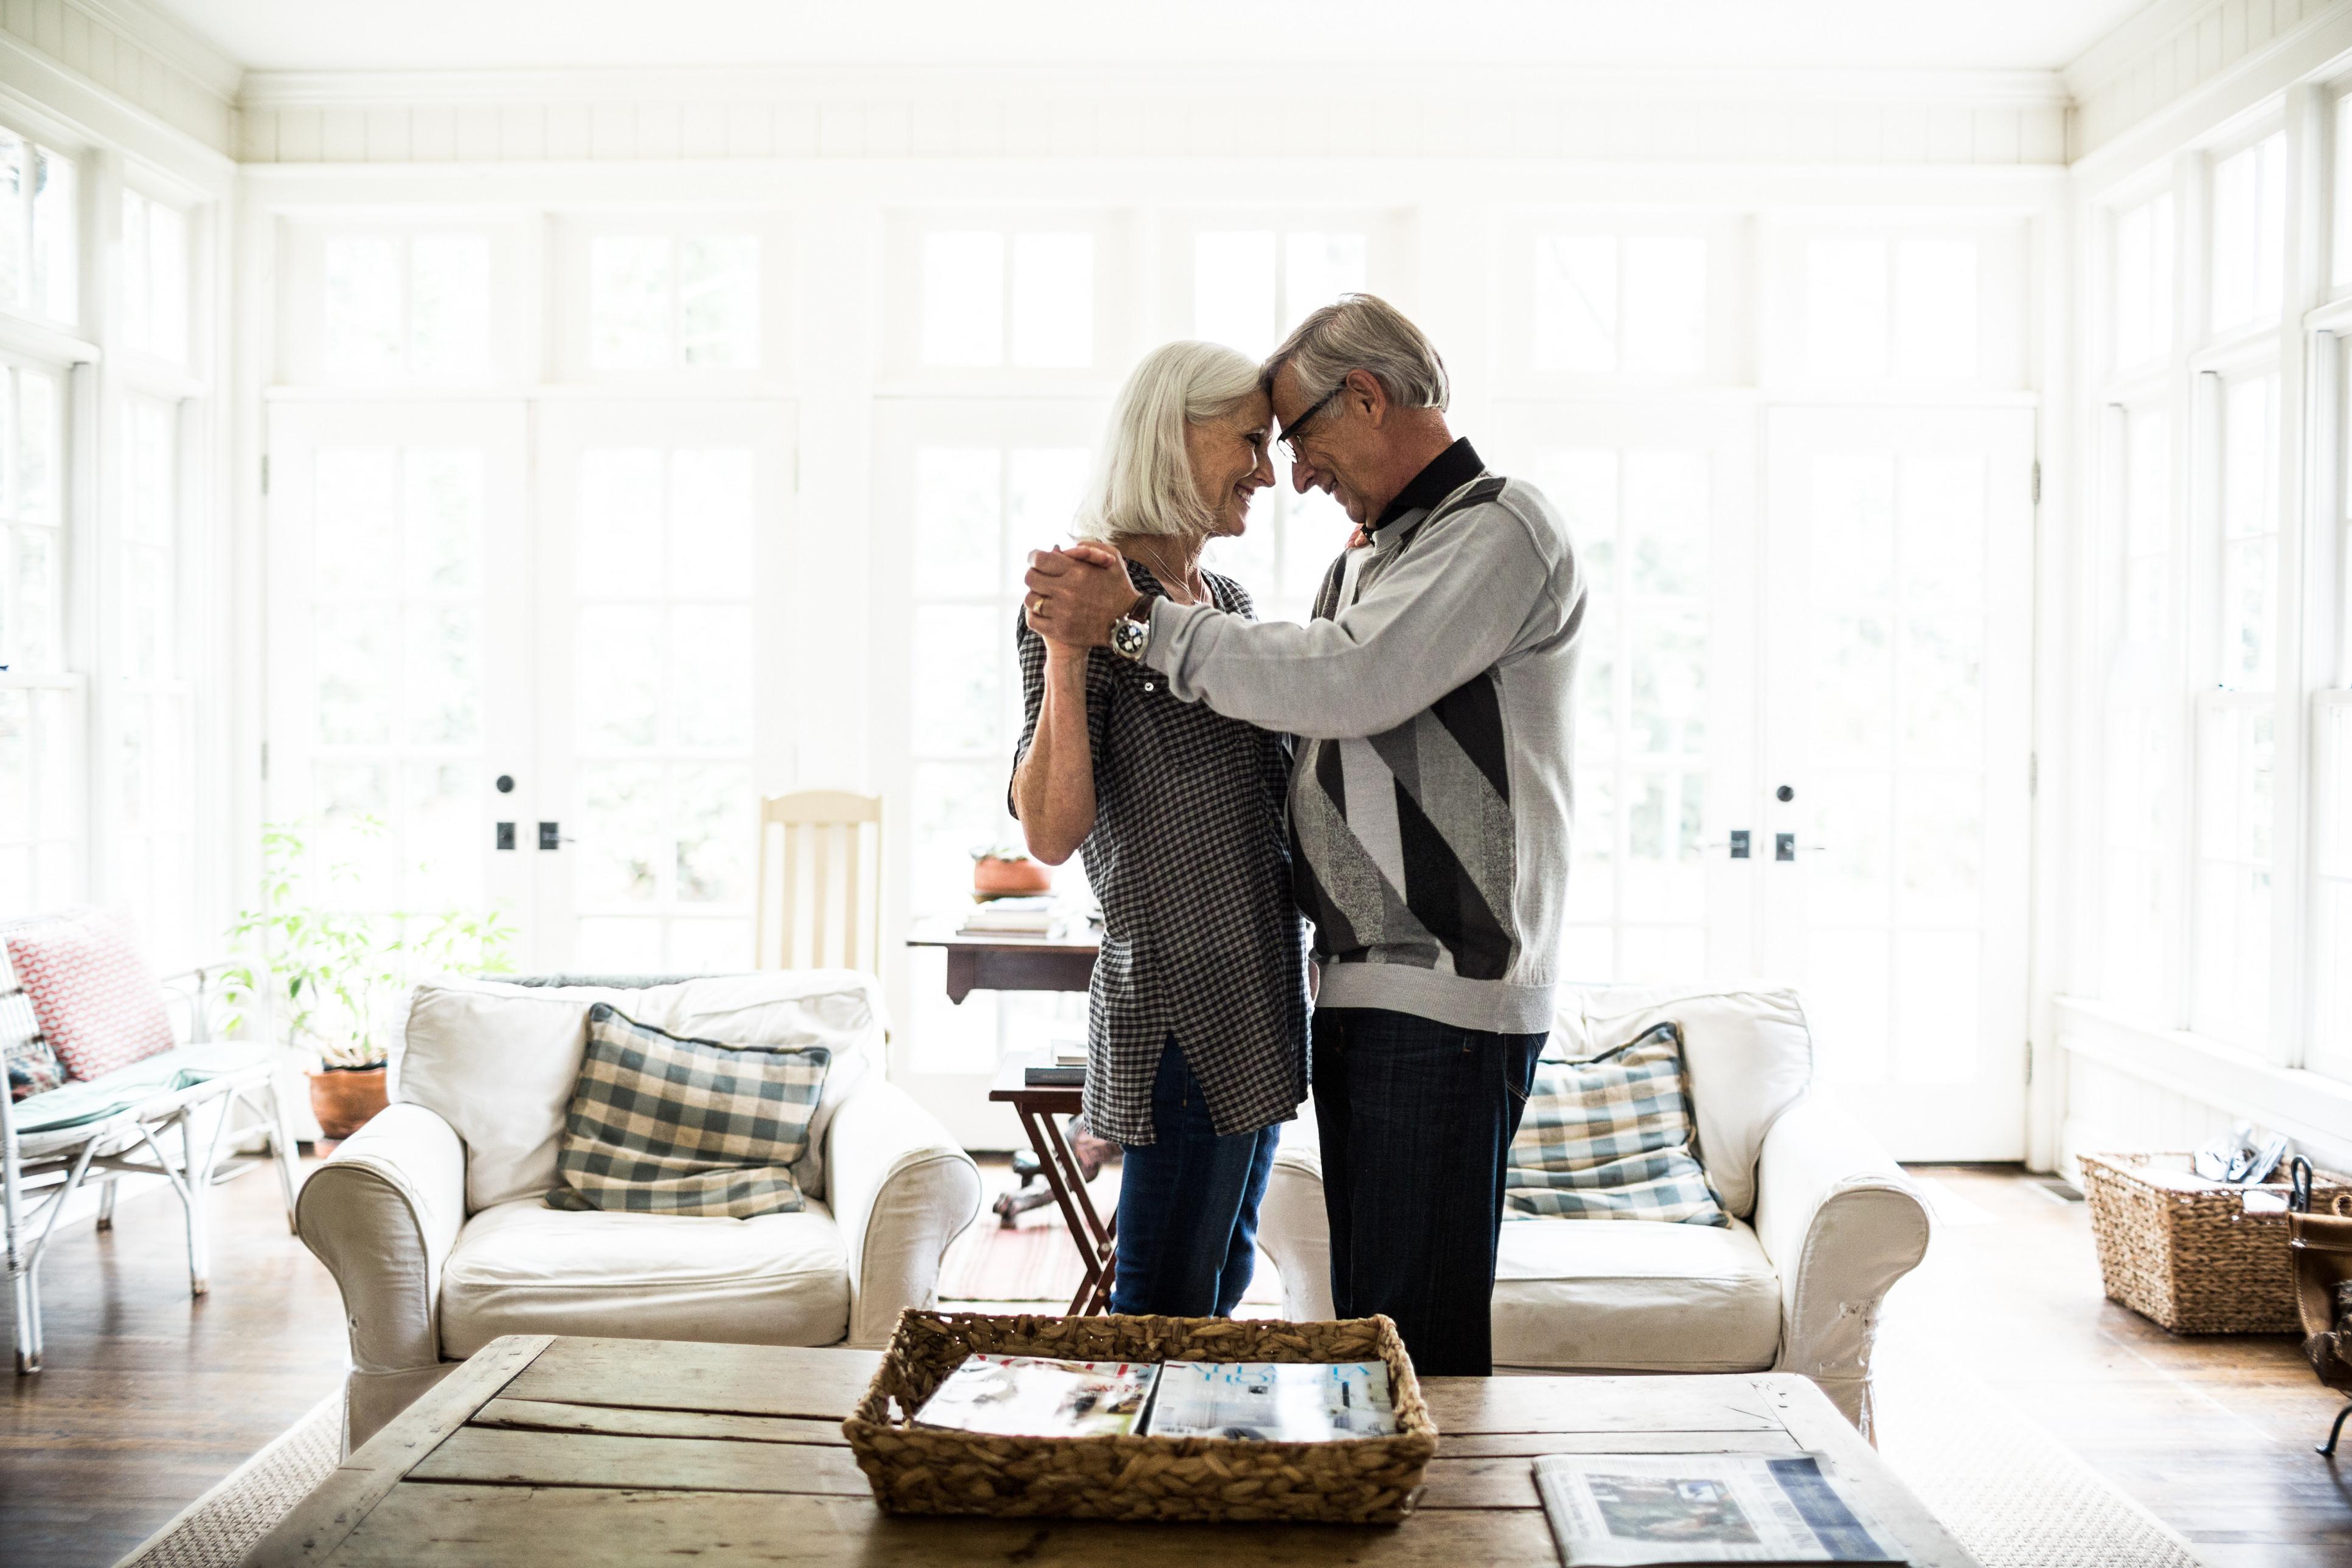 images of older people having sex